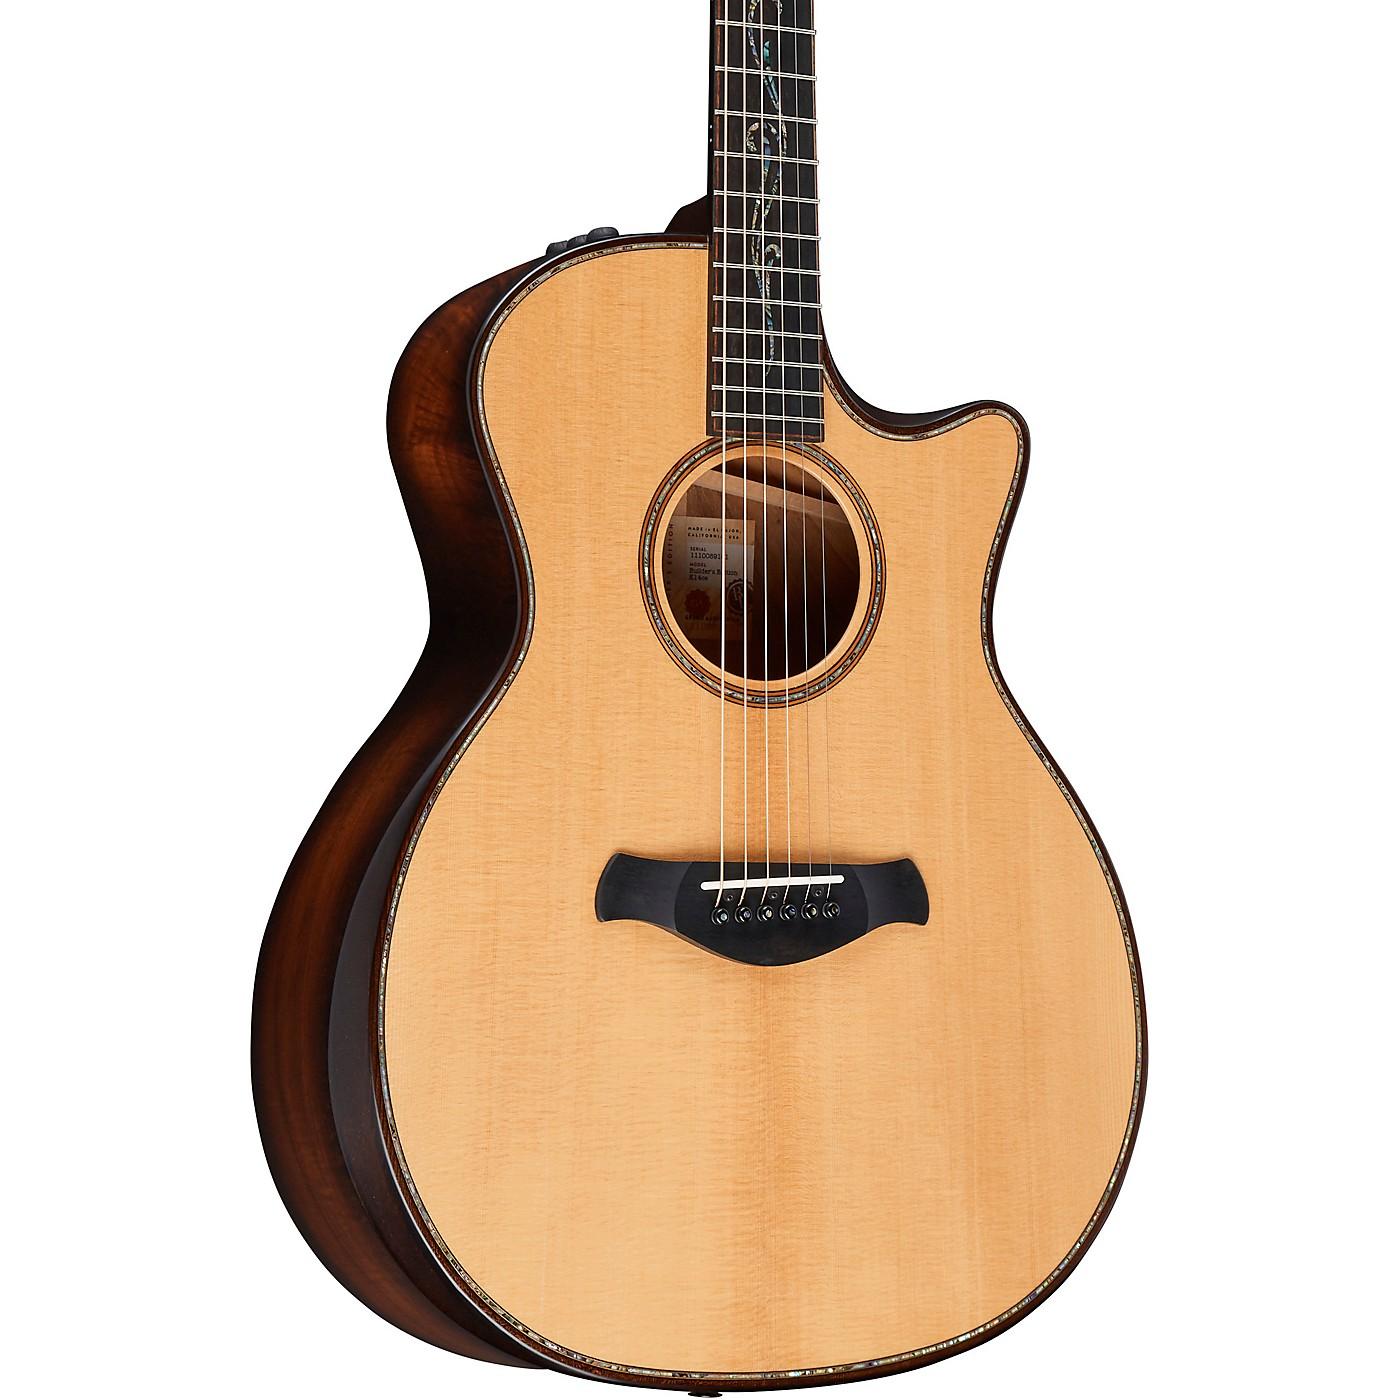 Taylor Builder's Edition K14ce V-Class Grand Auditorium Acoustic Electric Guitar thumbnail